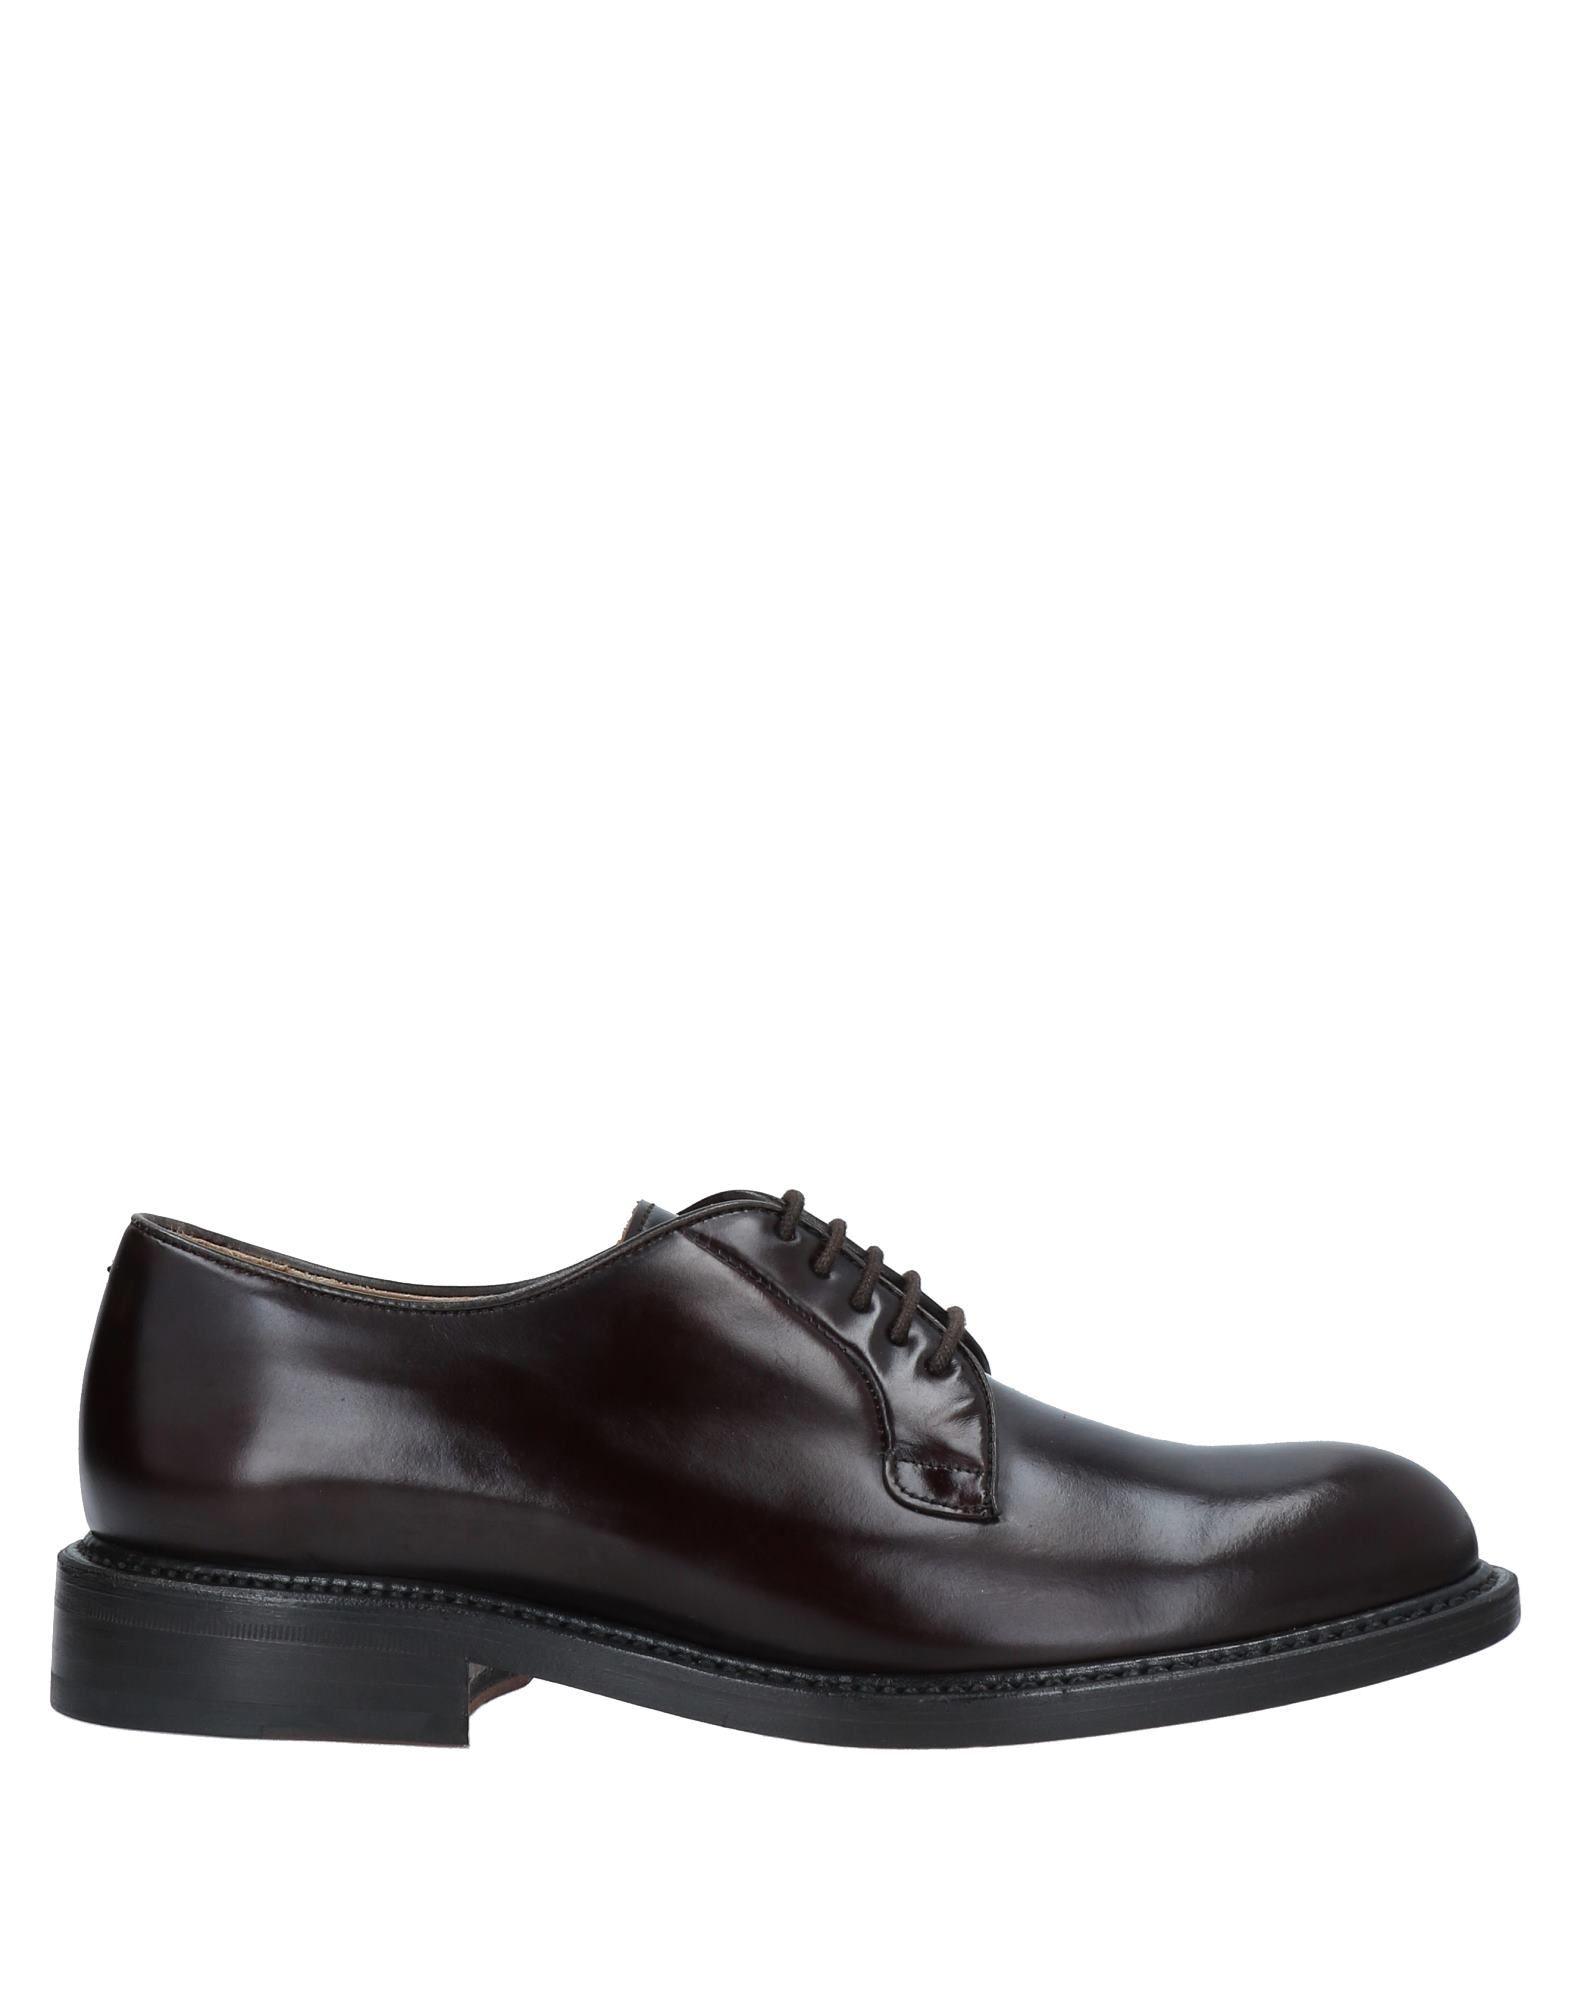 JOHN SPENCER Обувь на шнурках john spencer обувь на шнурках